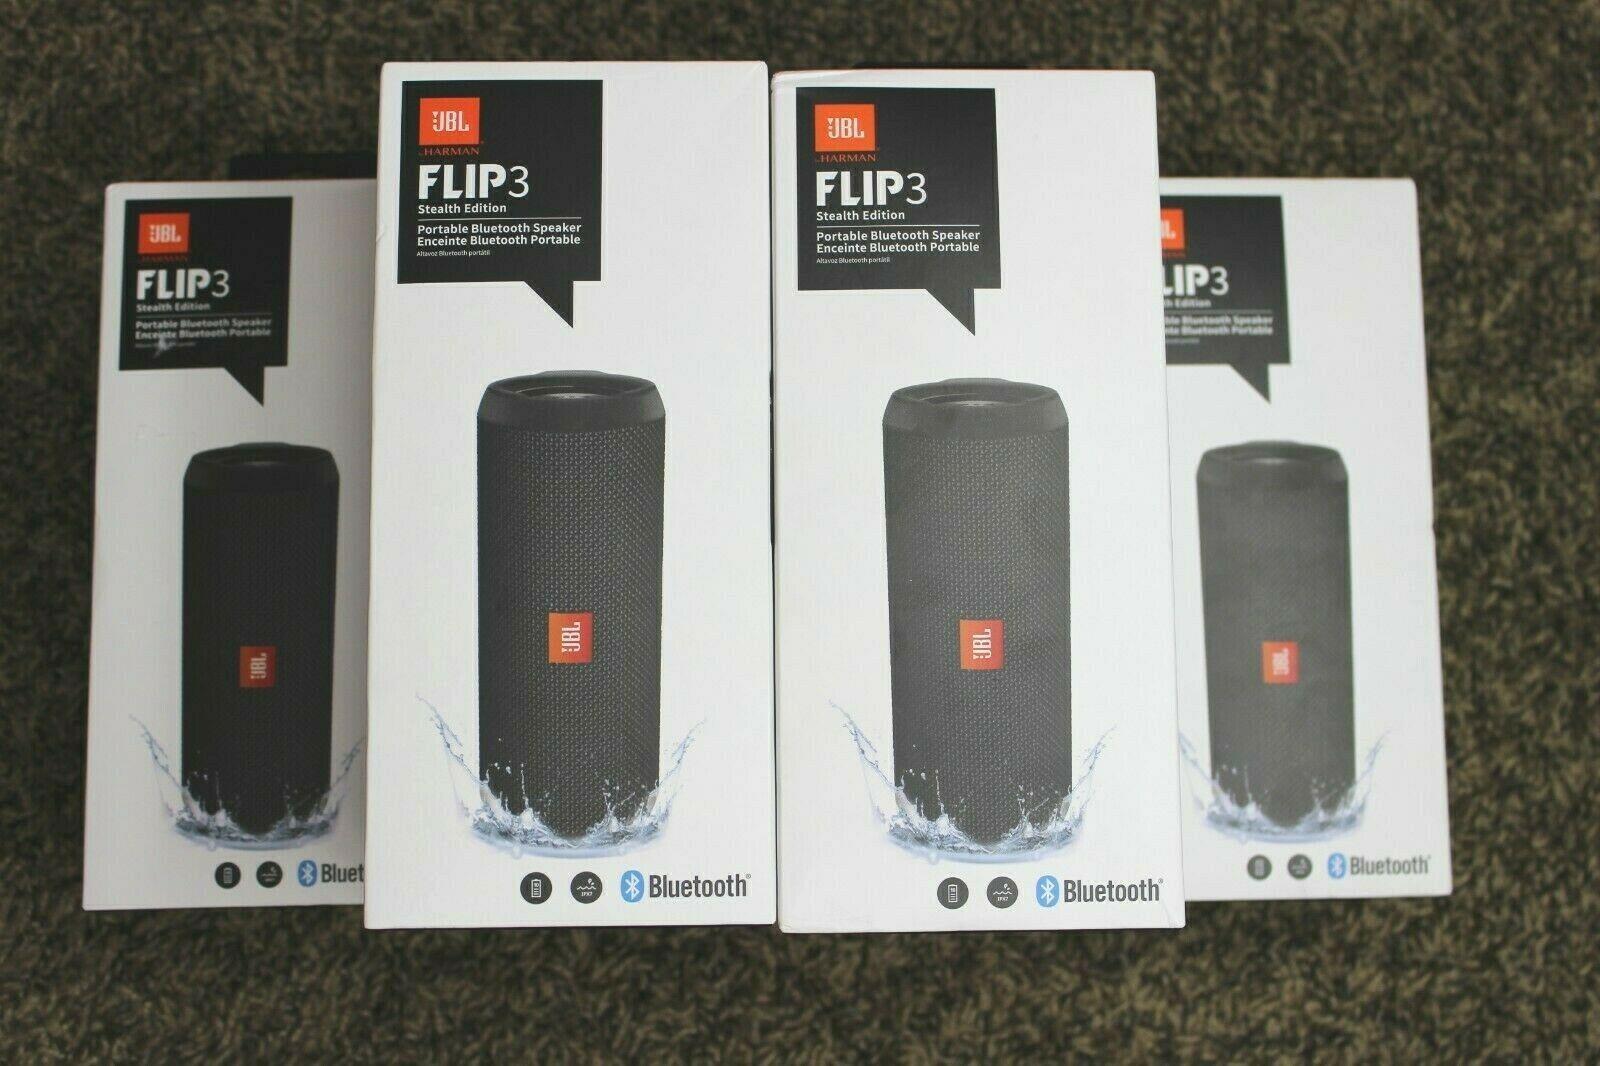 Jbl Flip 3 Stealth Edition Portable Bluetooth Speaker Black Ipx7 Waterproof New Blueto Waterproof Bluetooth Speaker New Bluetooth Speakers Bluetooth Speakers